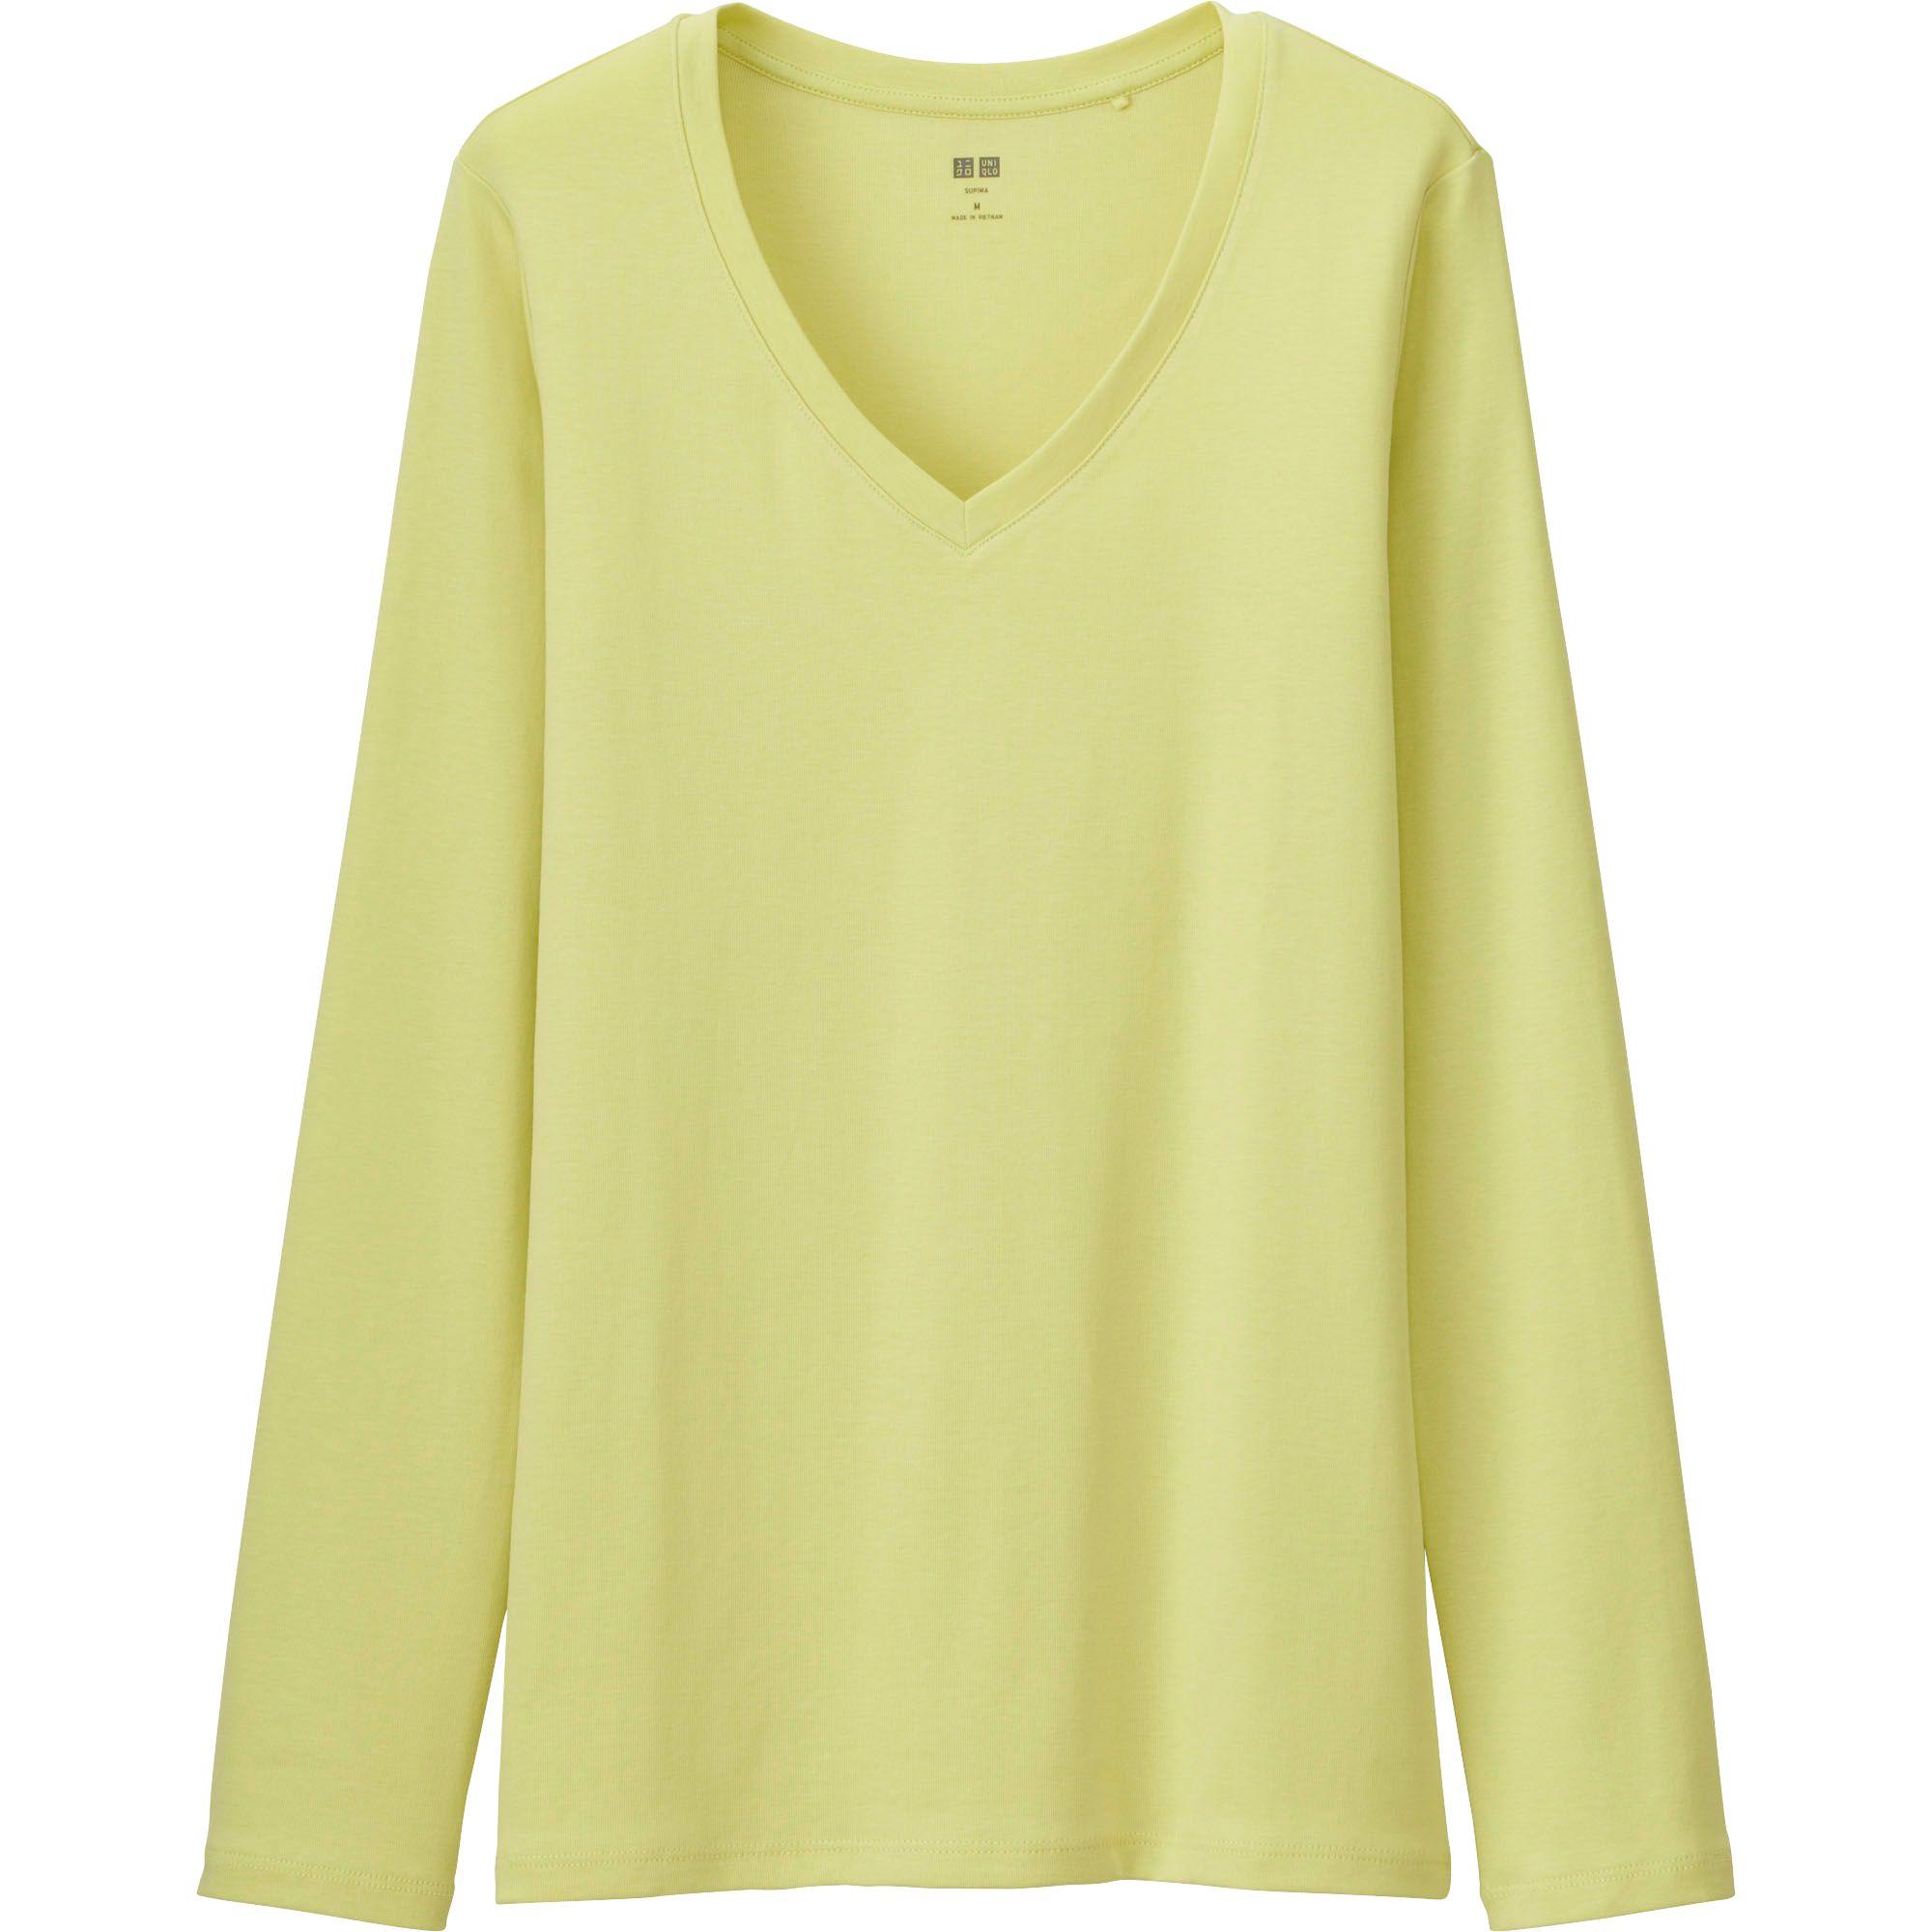 Uniqlo Women Supima Cotton V Neck Long Sleeve T Shirt In